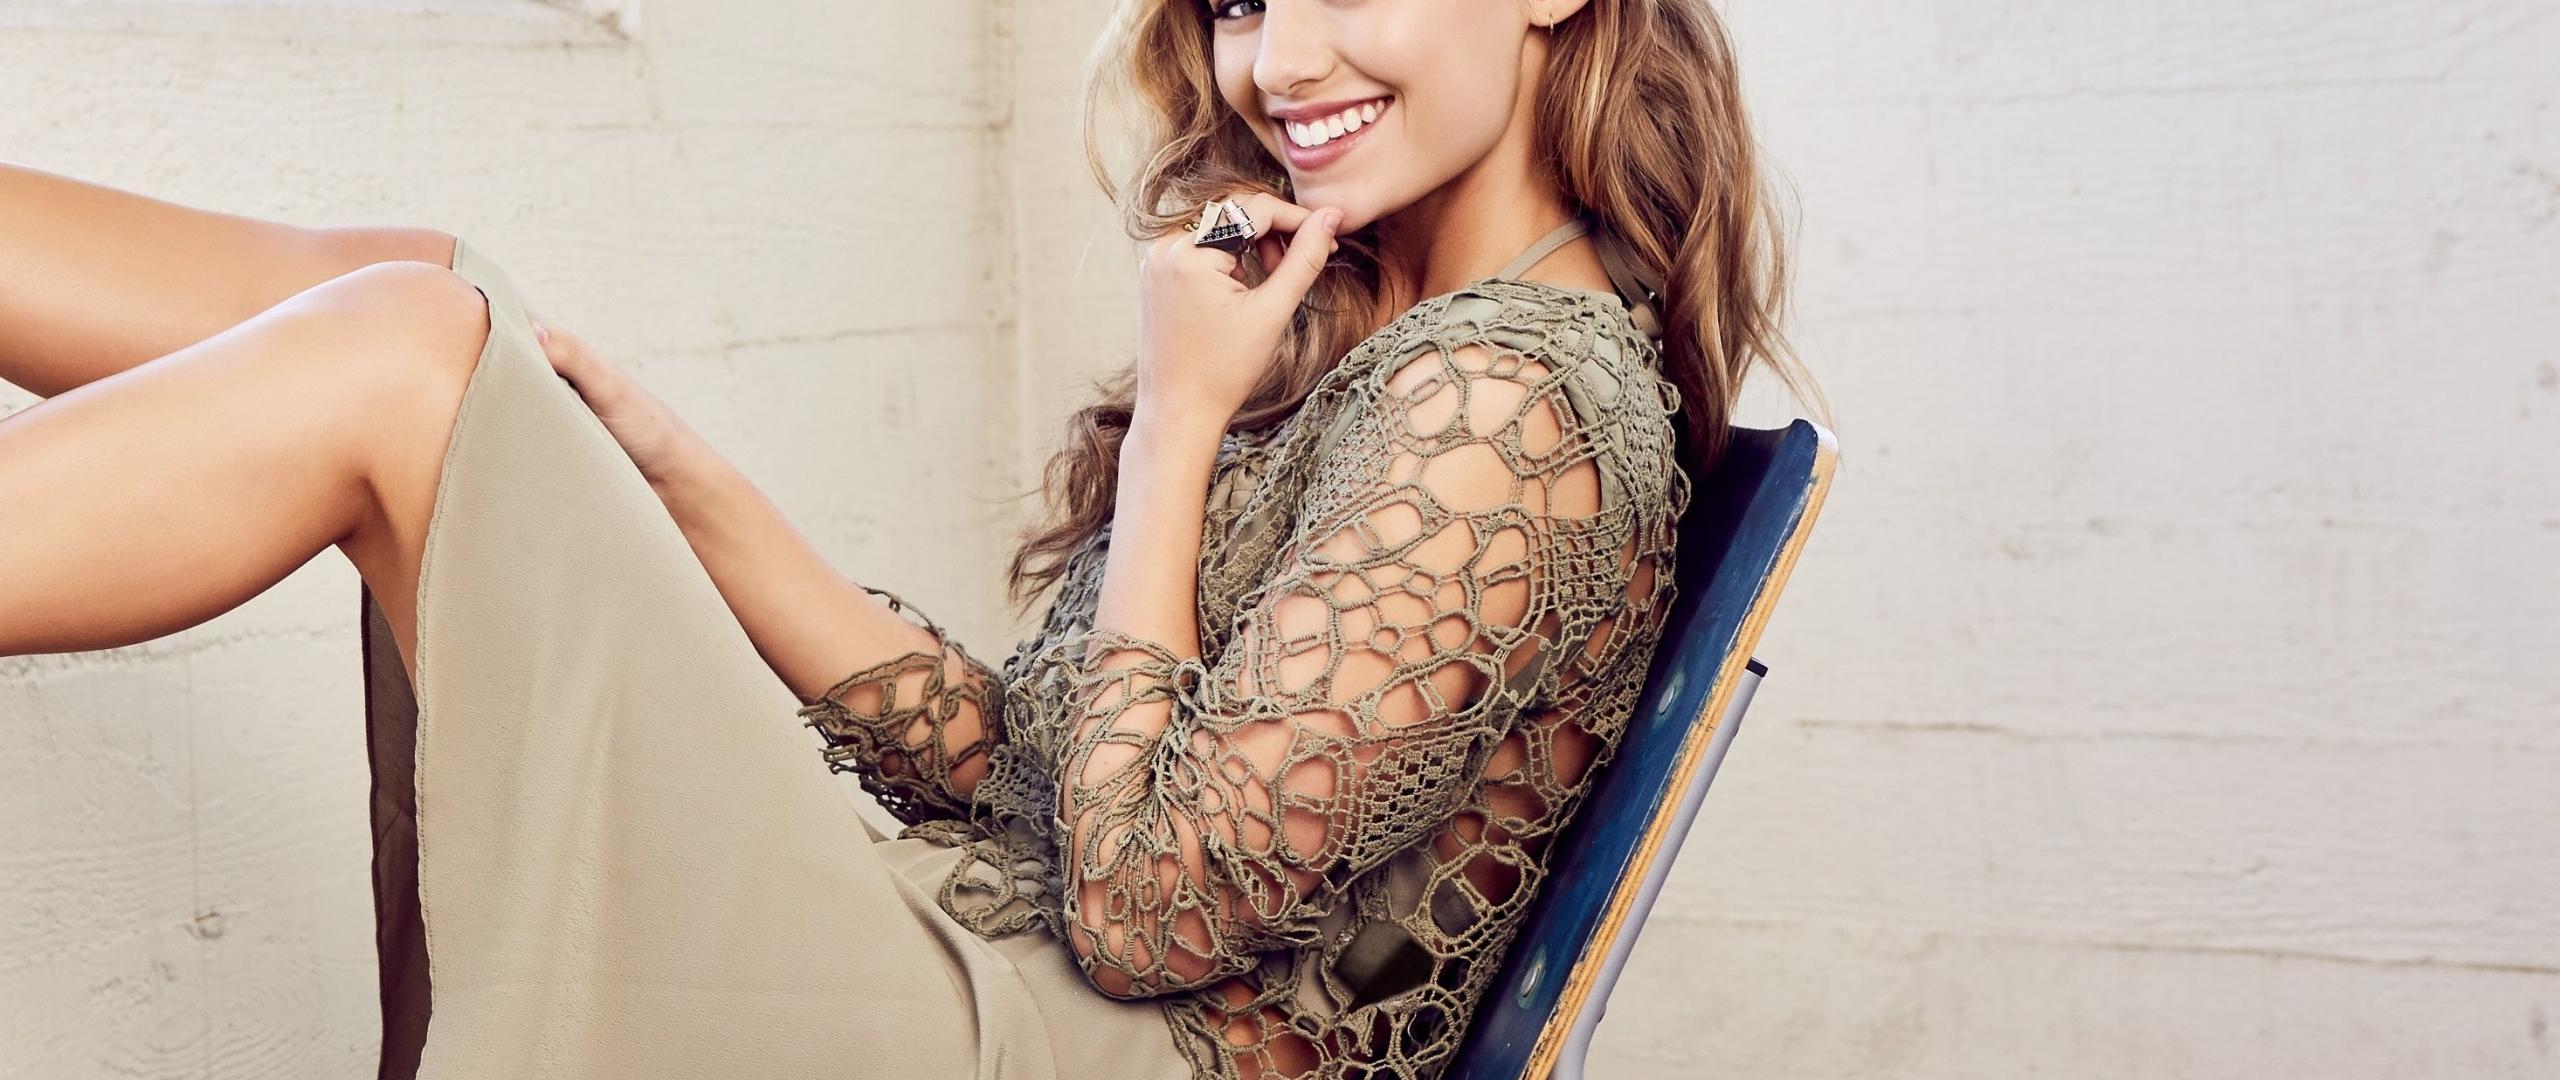 Madison Iseman, actress, smile, 2019, 2560x1080 wallpaper